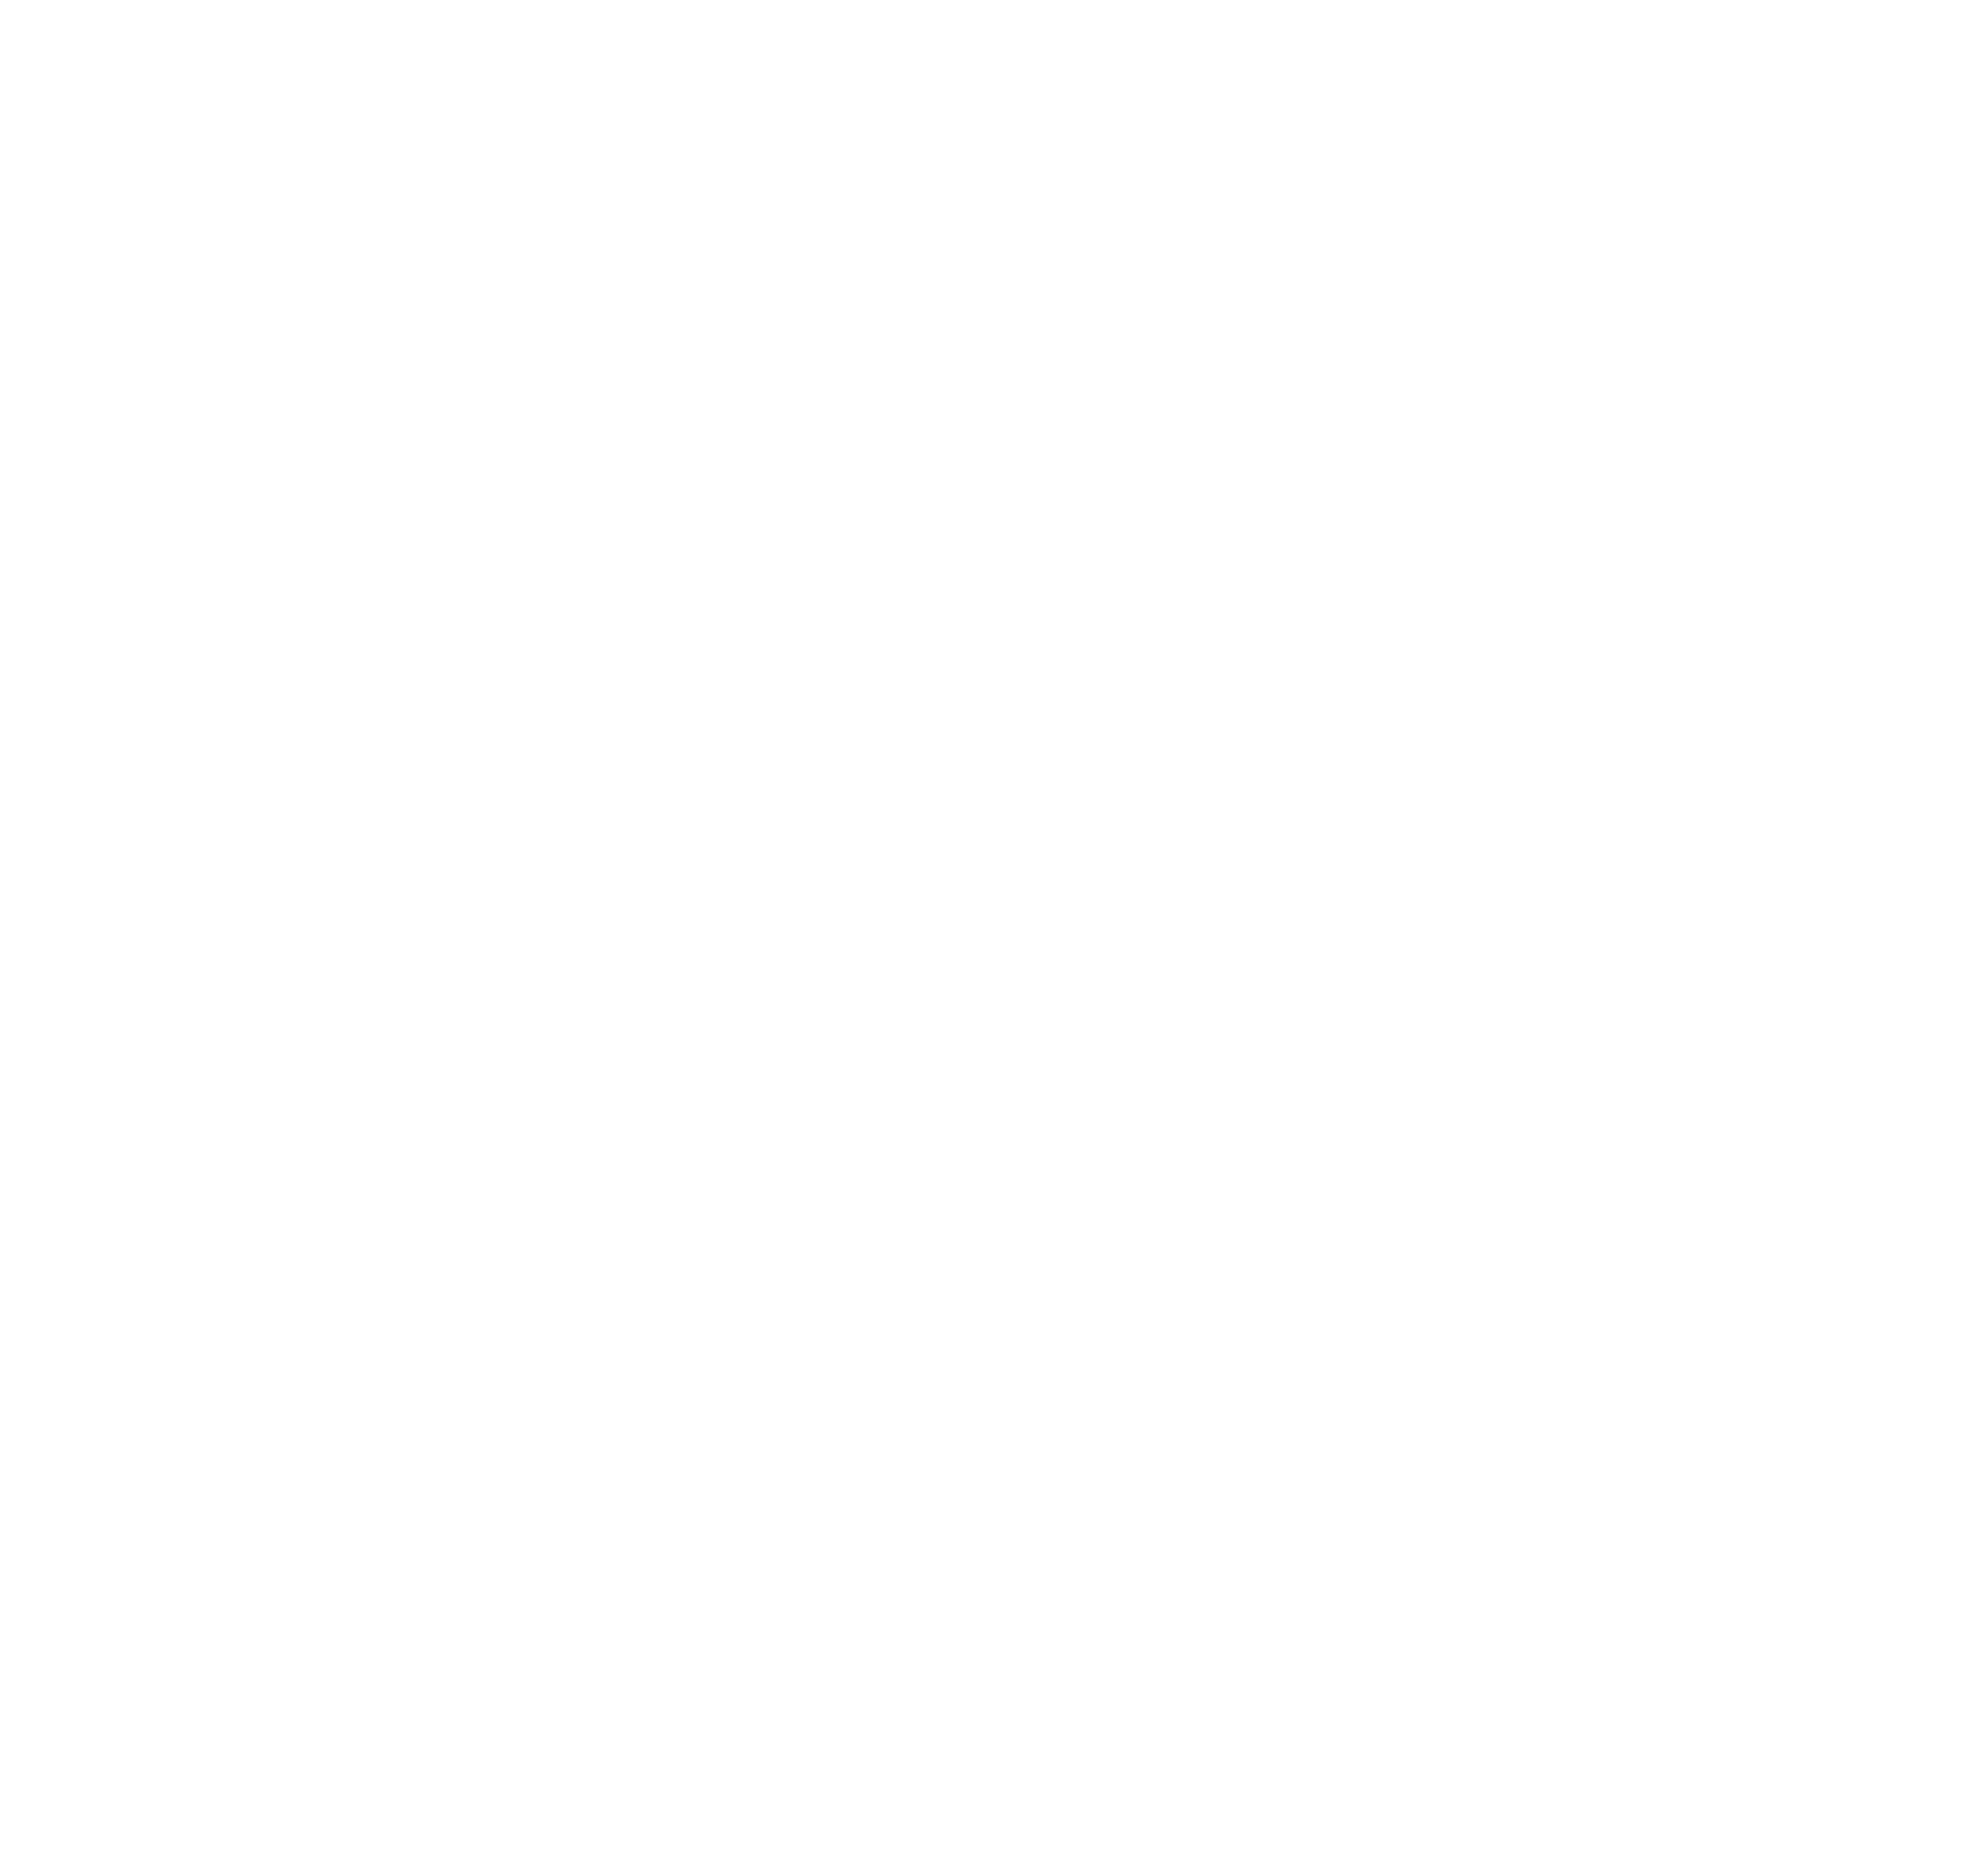 JuyenSebulba-Logo-Initials-White.png